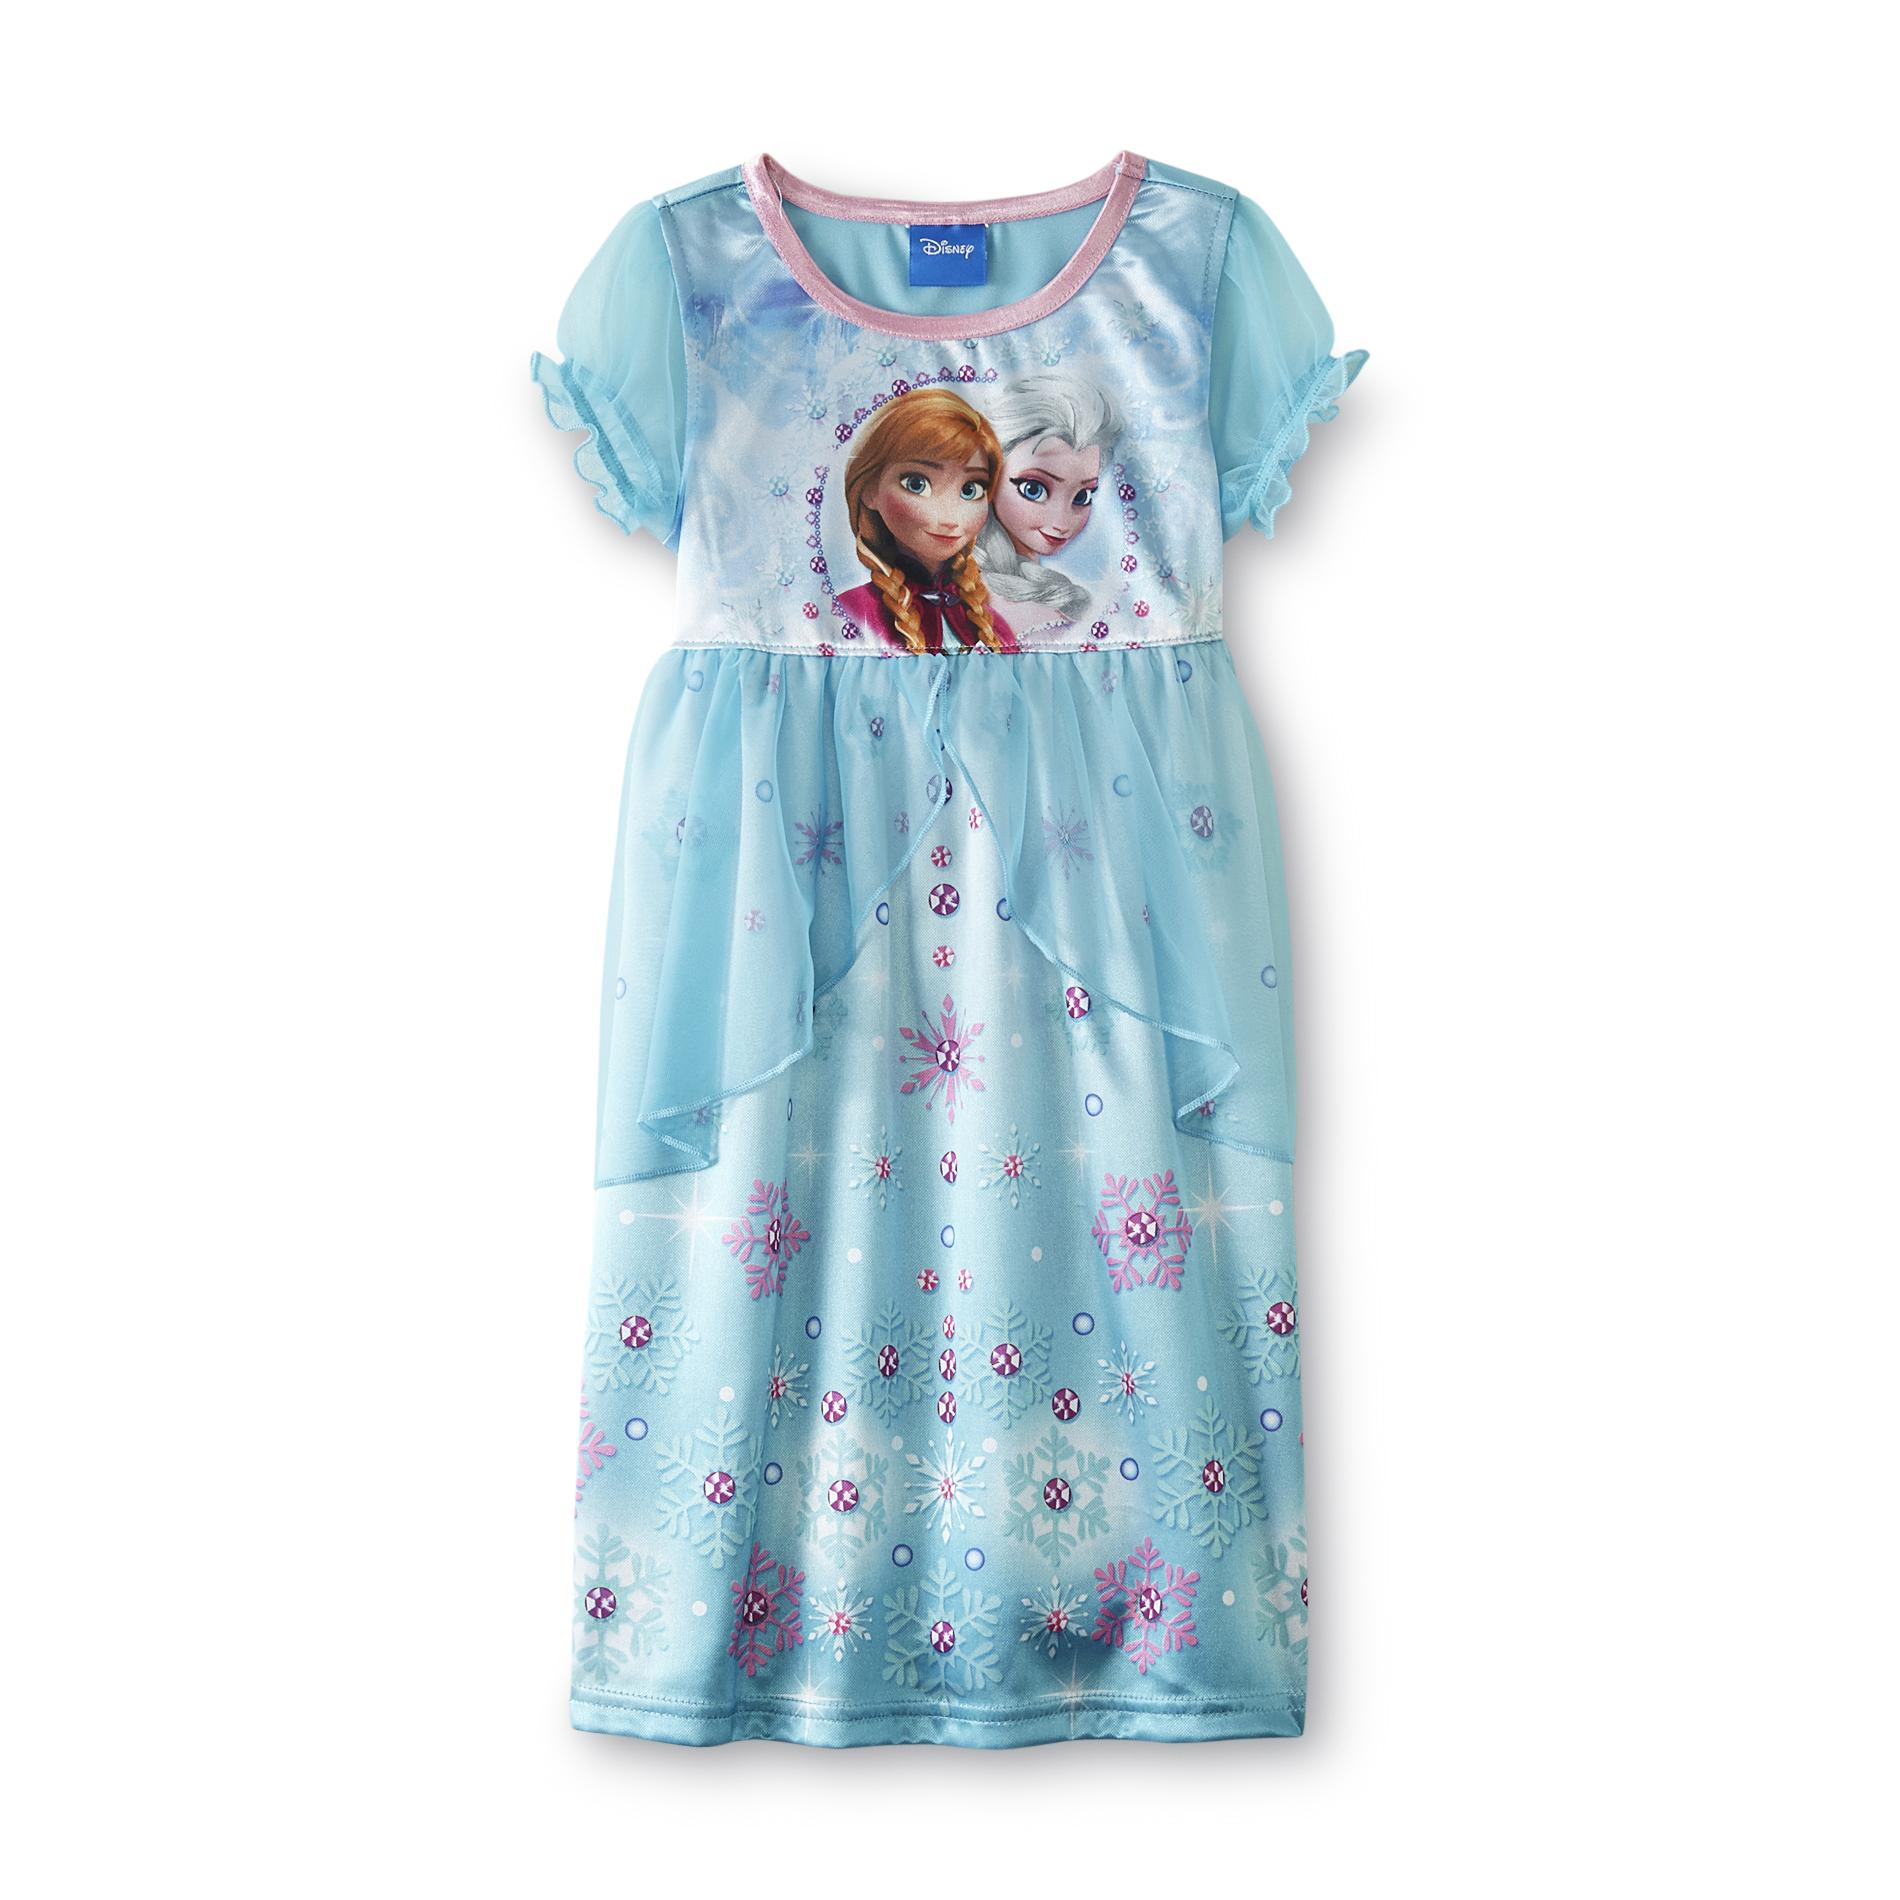 Disney Baby Frozen Toddler Girl's Nightgown - Anna & Elsa